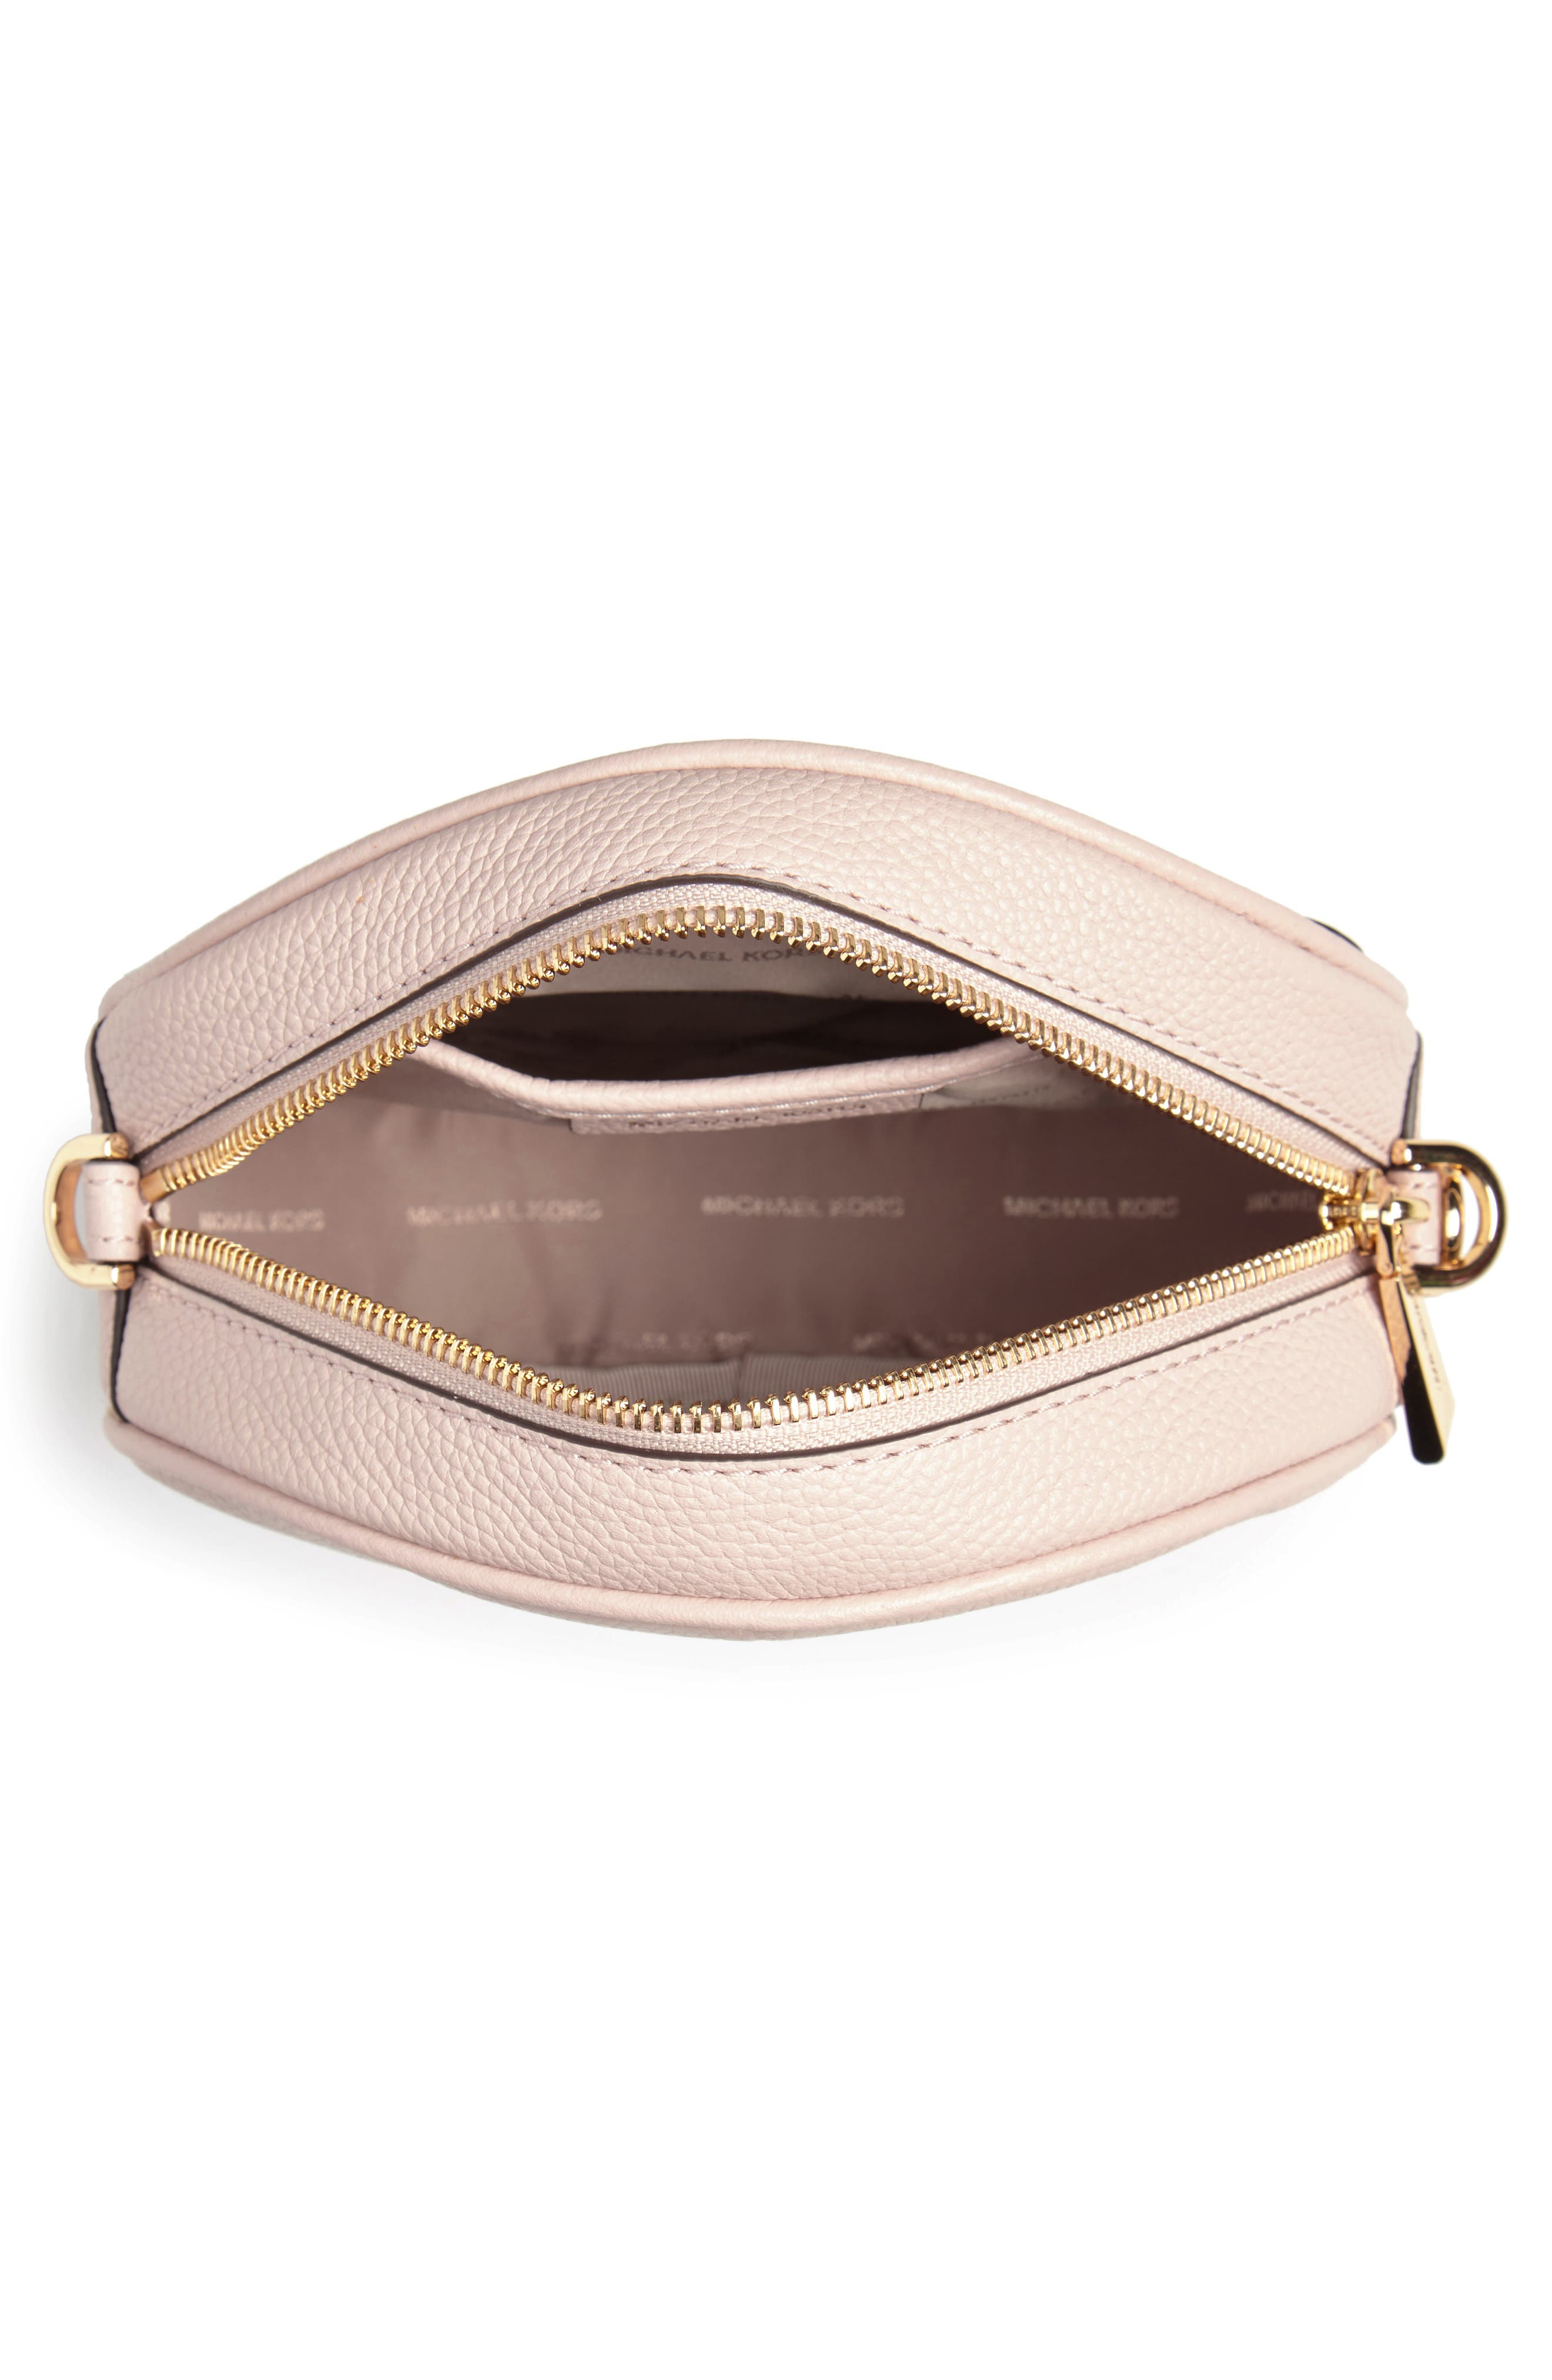 Medium Leather Canteen Bag,                             Alternate thumbnail 12, color,